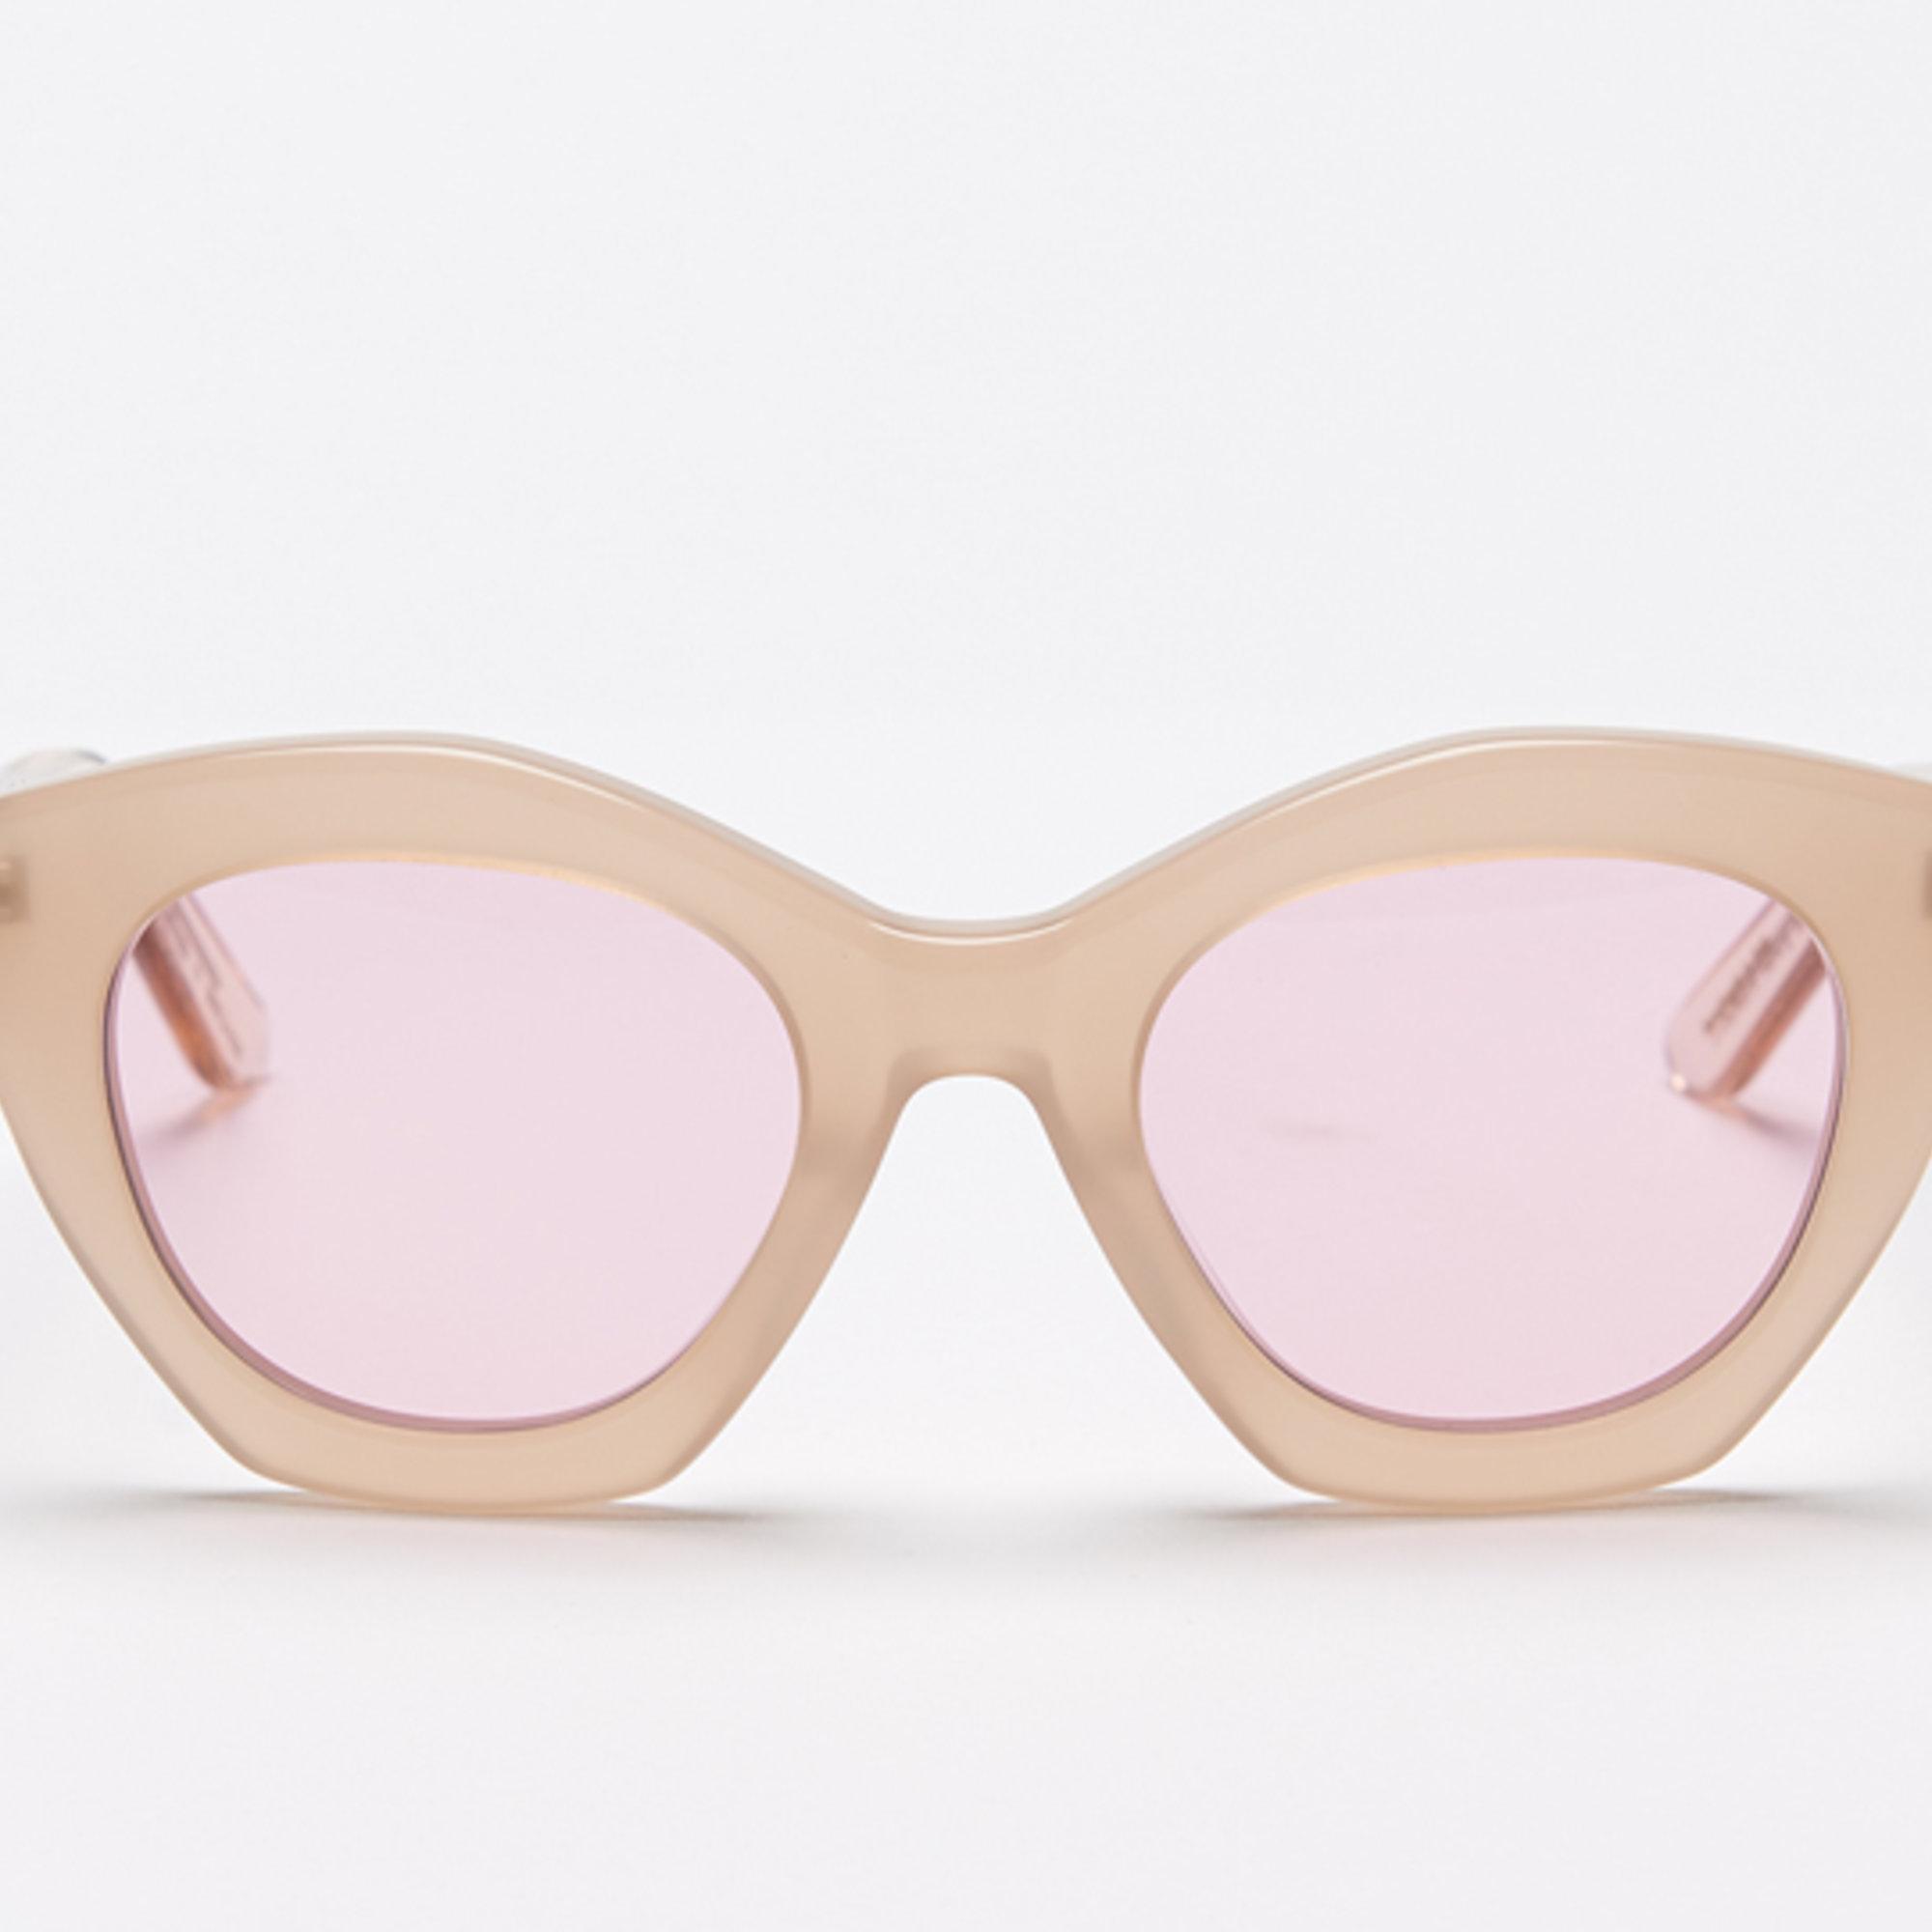 Ace & Tate Sunglasses |  acetate in Beige, Brown, Pink